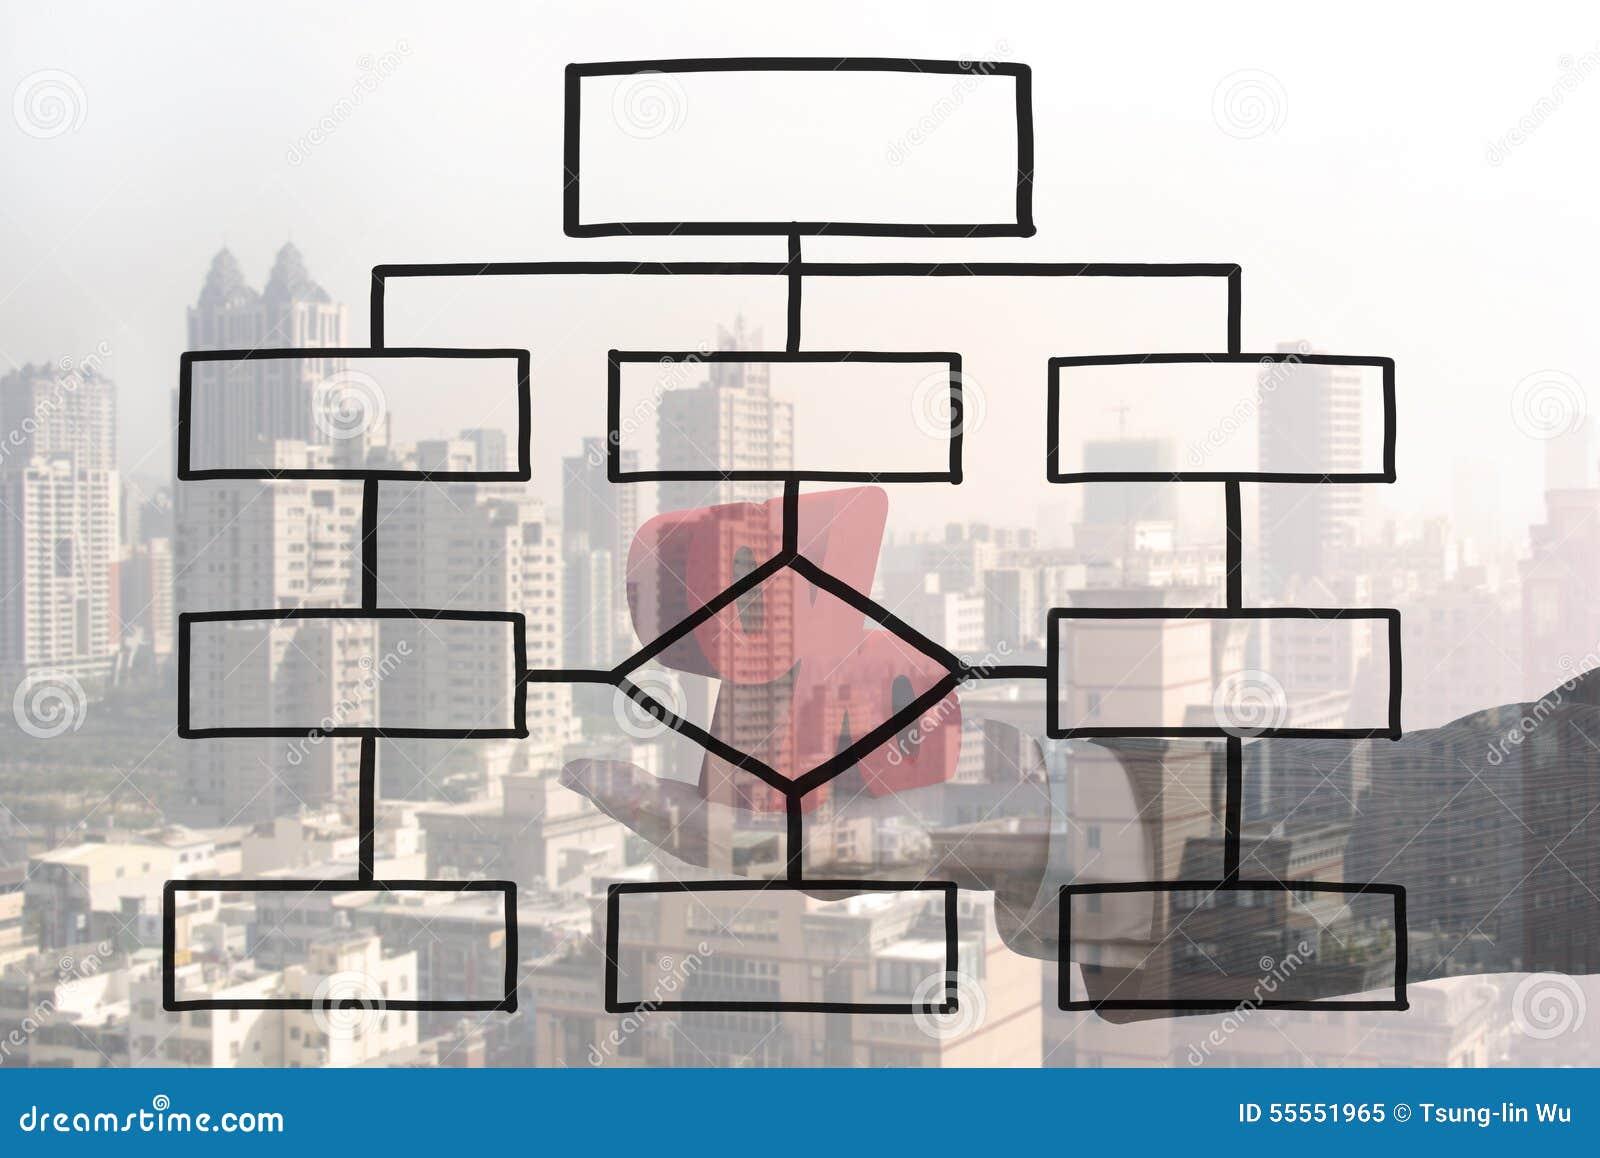 blank organization chart stock illustration illustration of